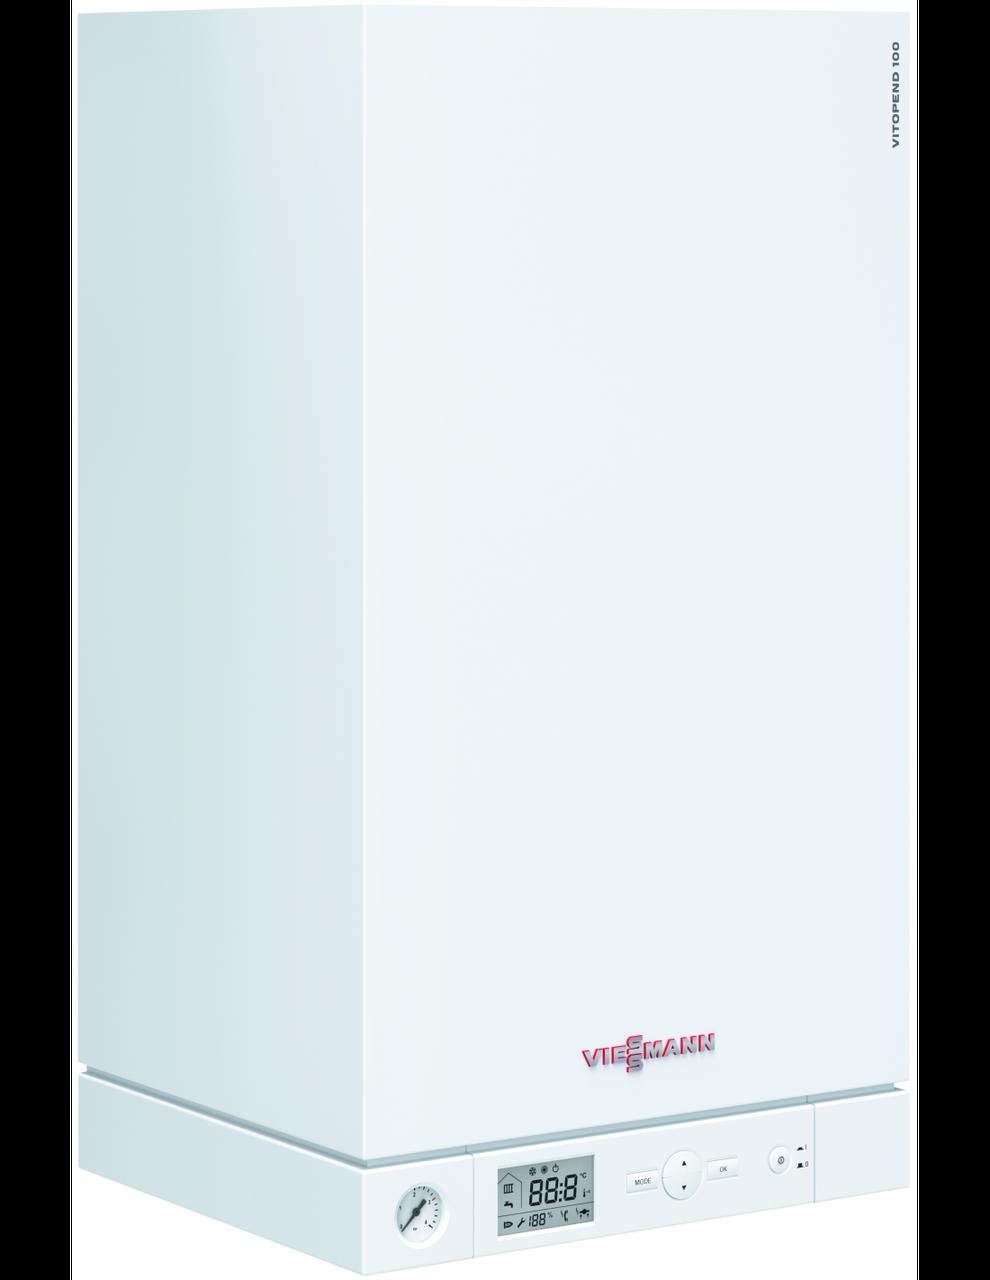 Viessmann Vitopend 100W A1 JB 12 kW настенный газовый двухконтурный котел